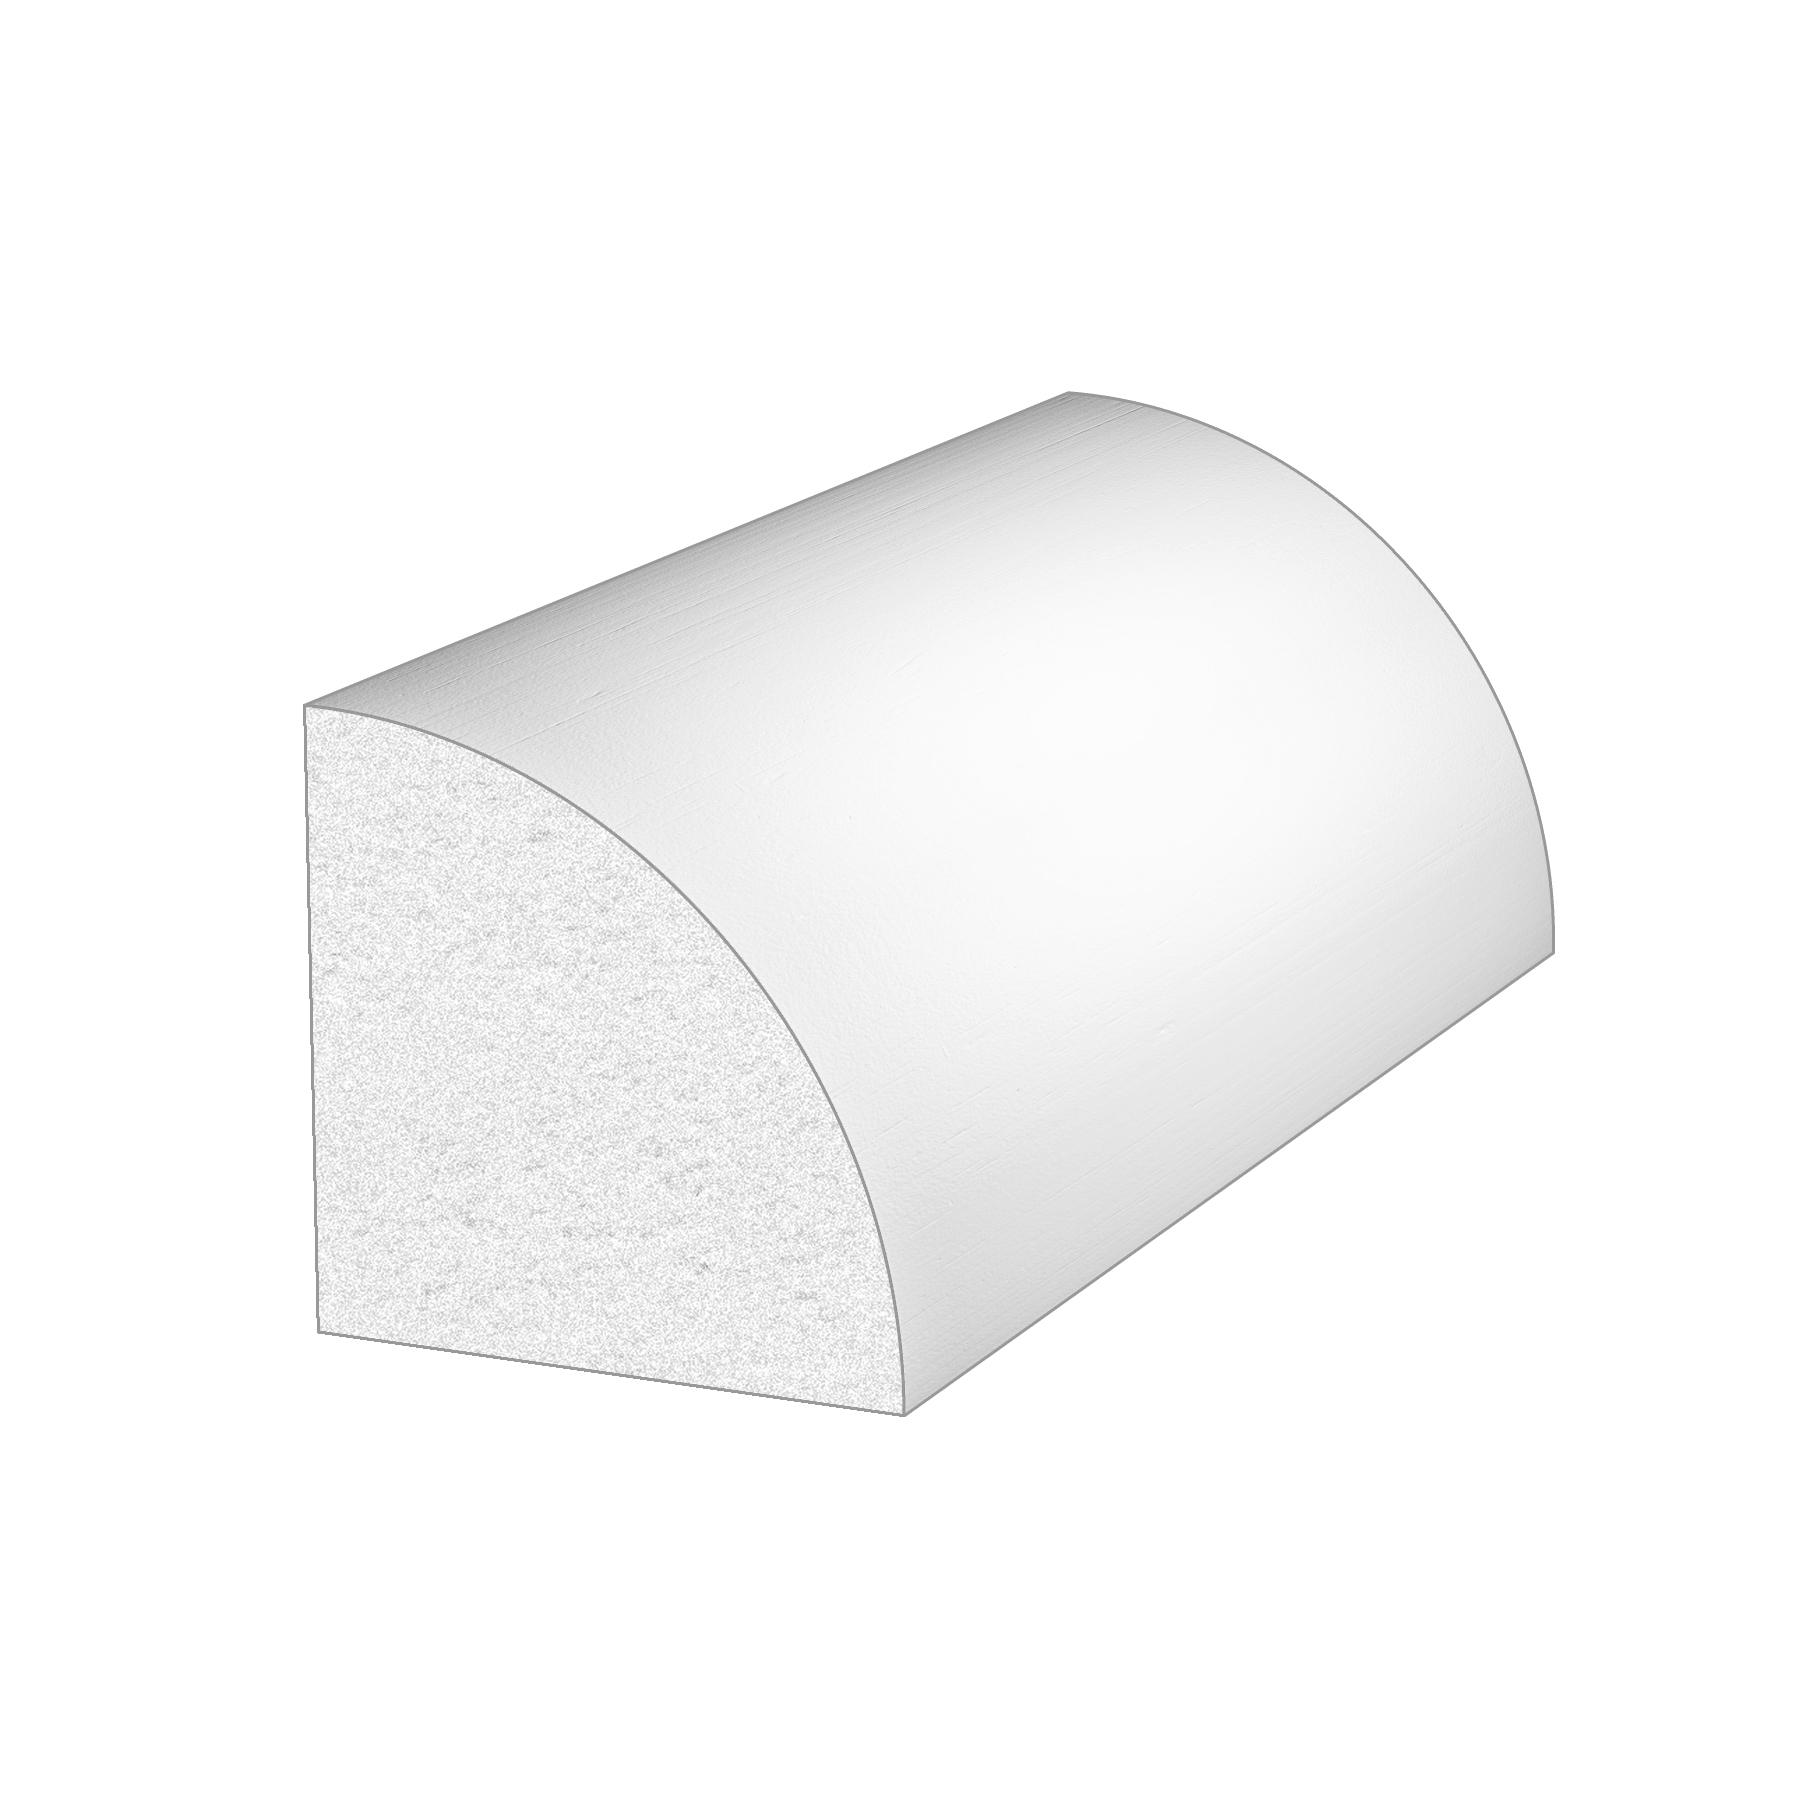 Palight White Pvc Quarter Round Moulding